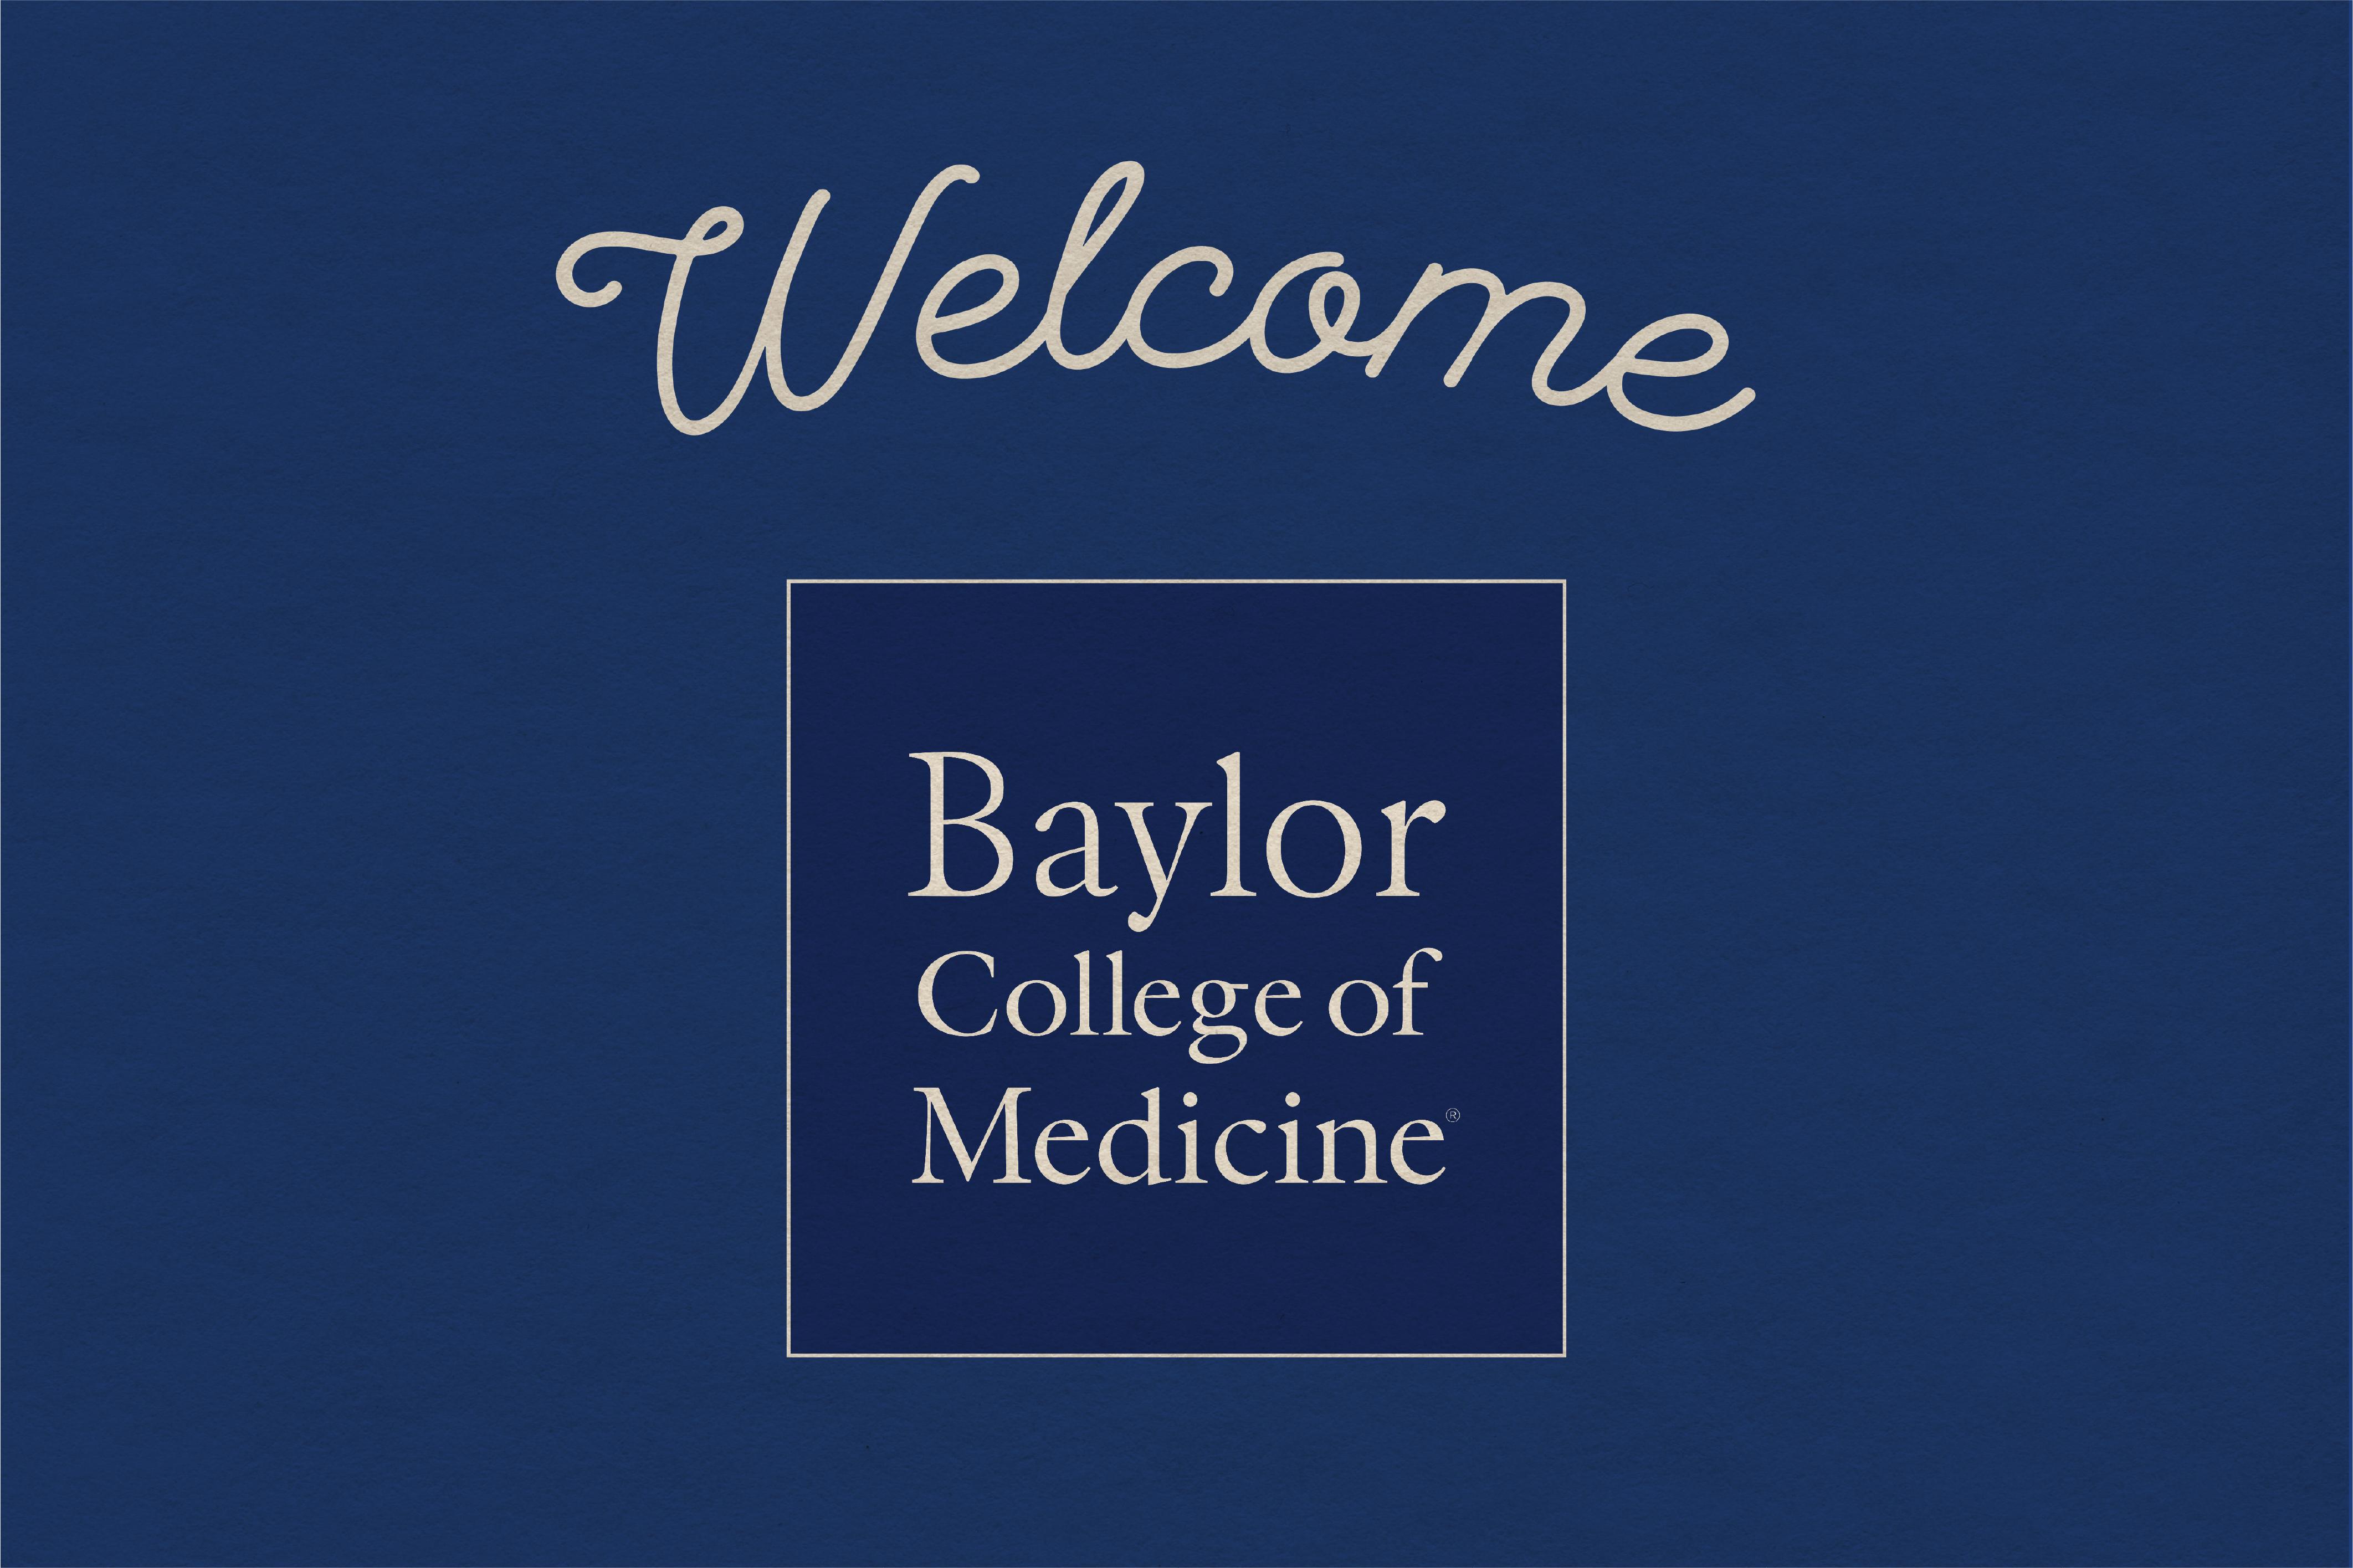 Welcome, Baylor College of Medicine